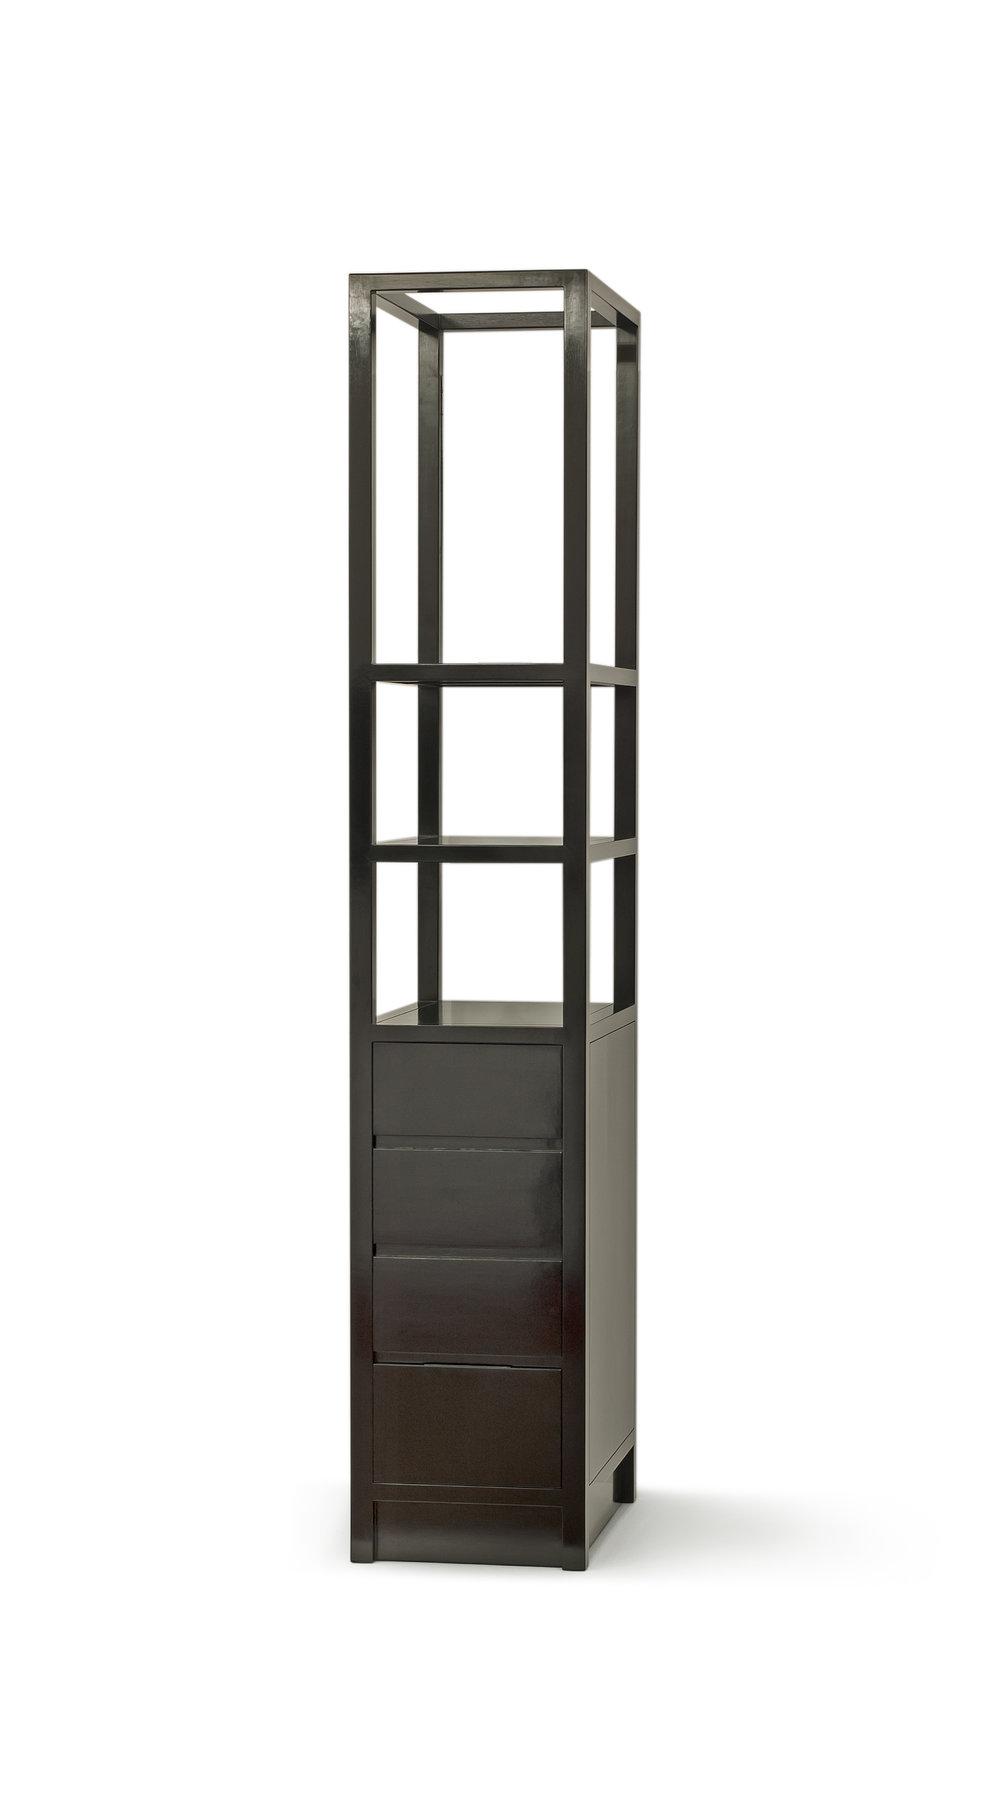 ....bespoke chinese furniture : tall shelf cabinet..特别定制设计中式家具 :高柜架....